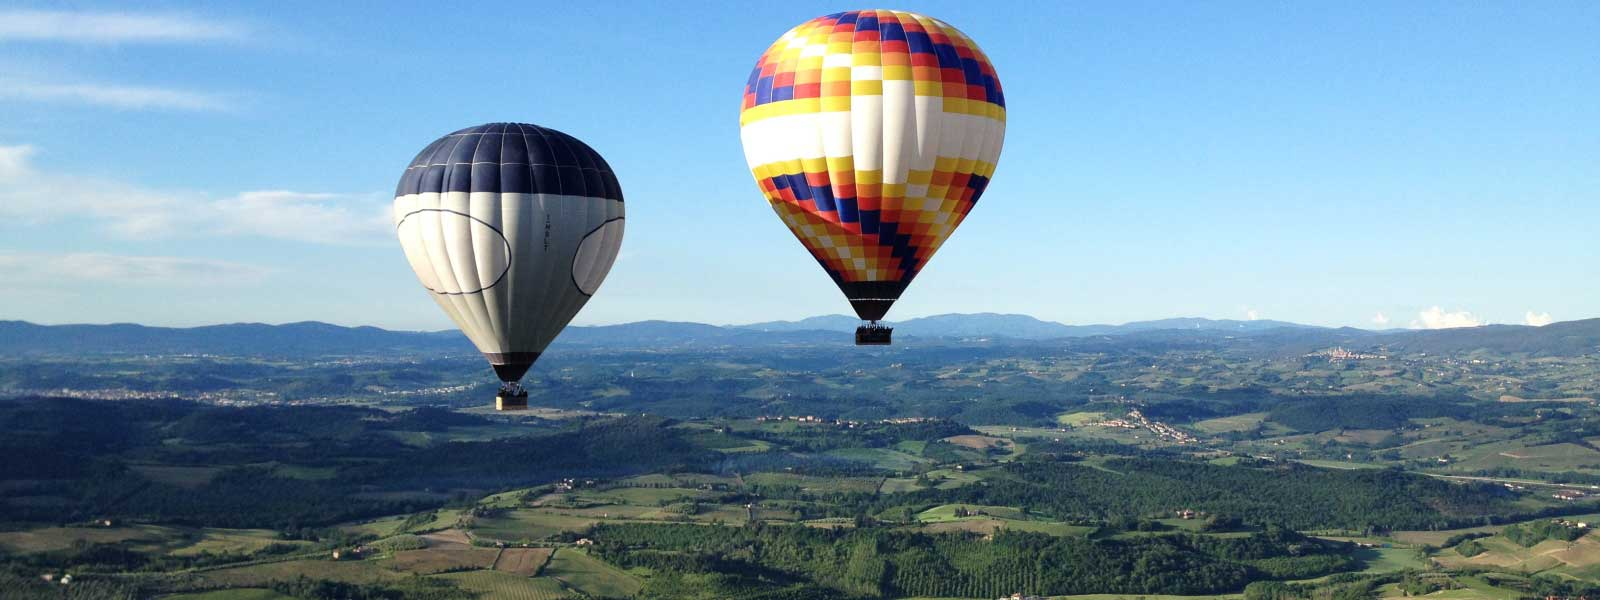 balloons-in-flight-towards-san-gimignano